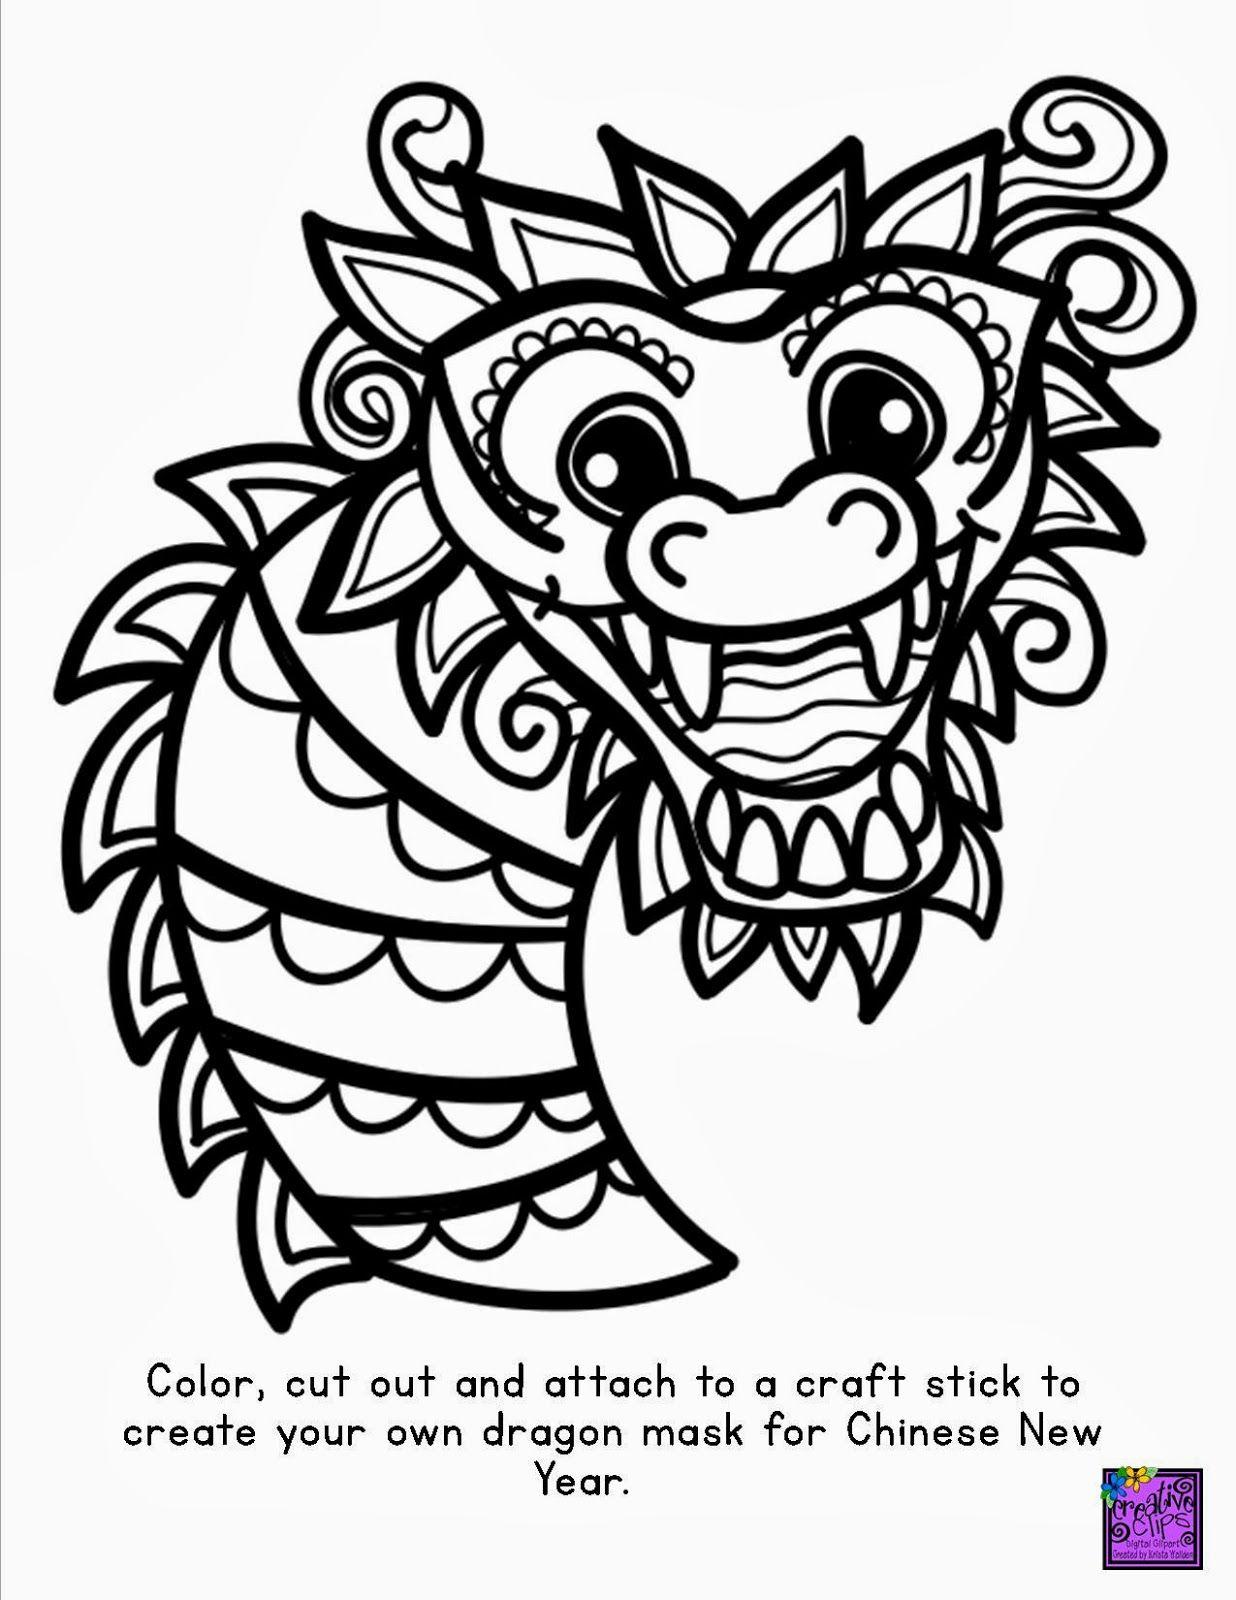 Lory S Page Chinese New Year Giveaway Freebie Chinese Draak Draken Knutsels Chinees Nieuwjaar